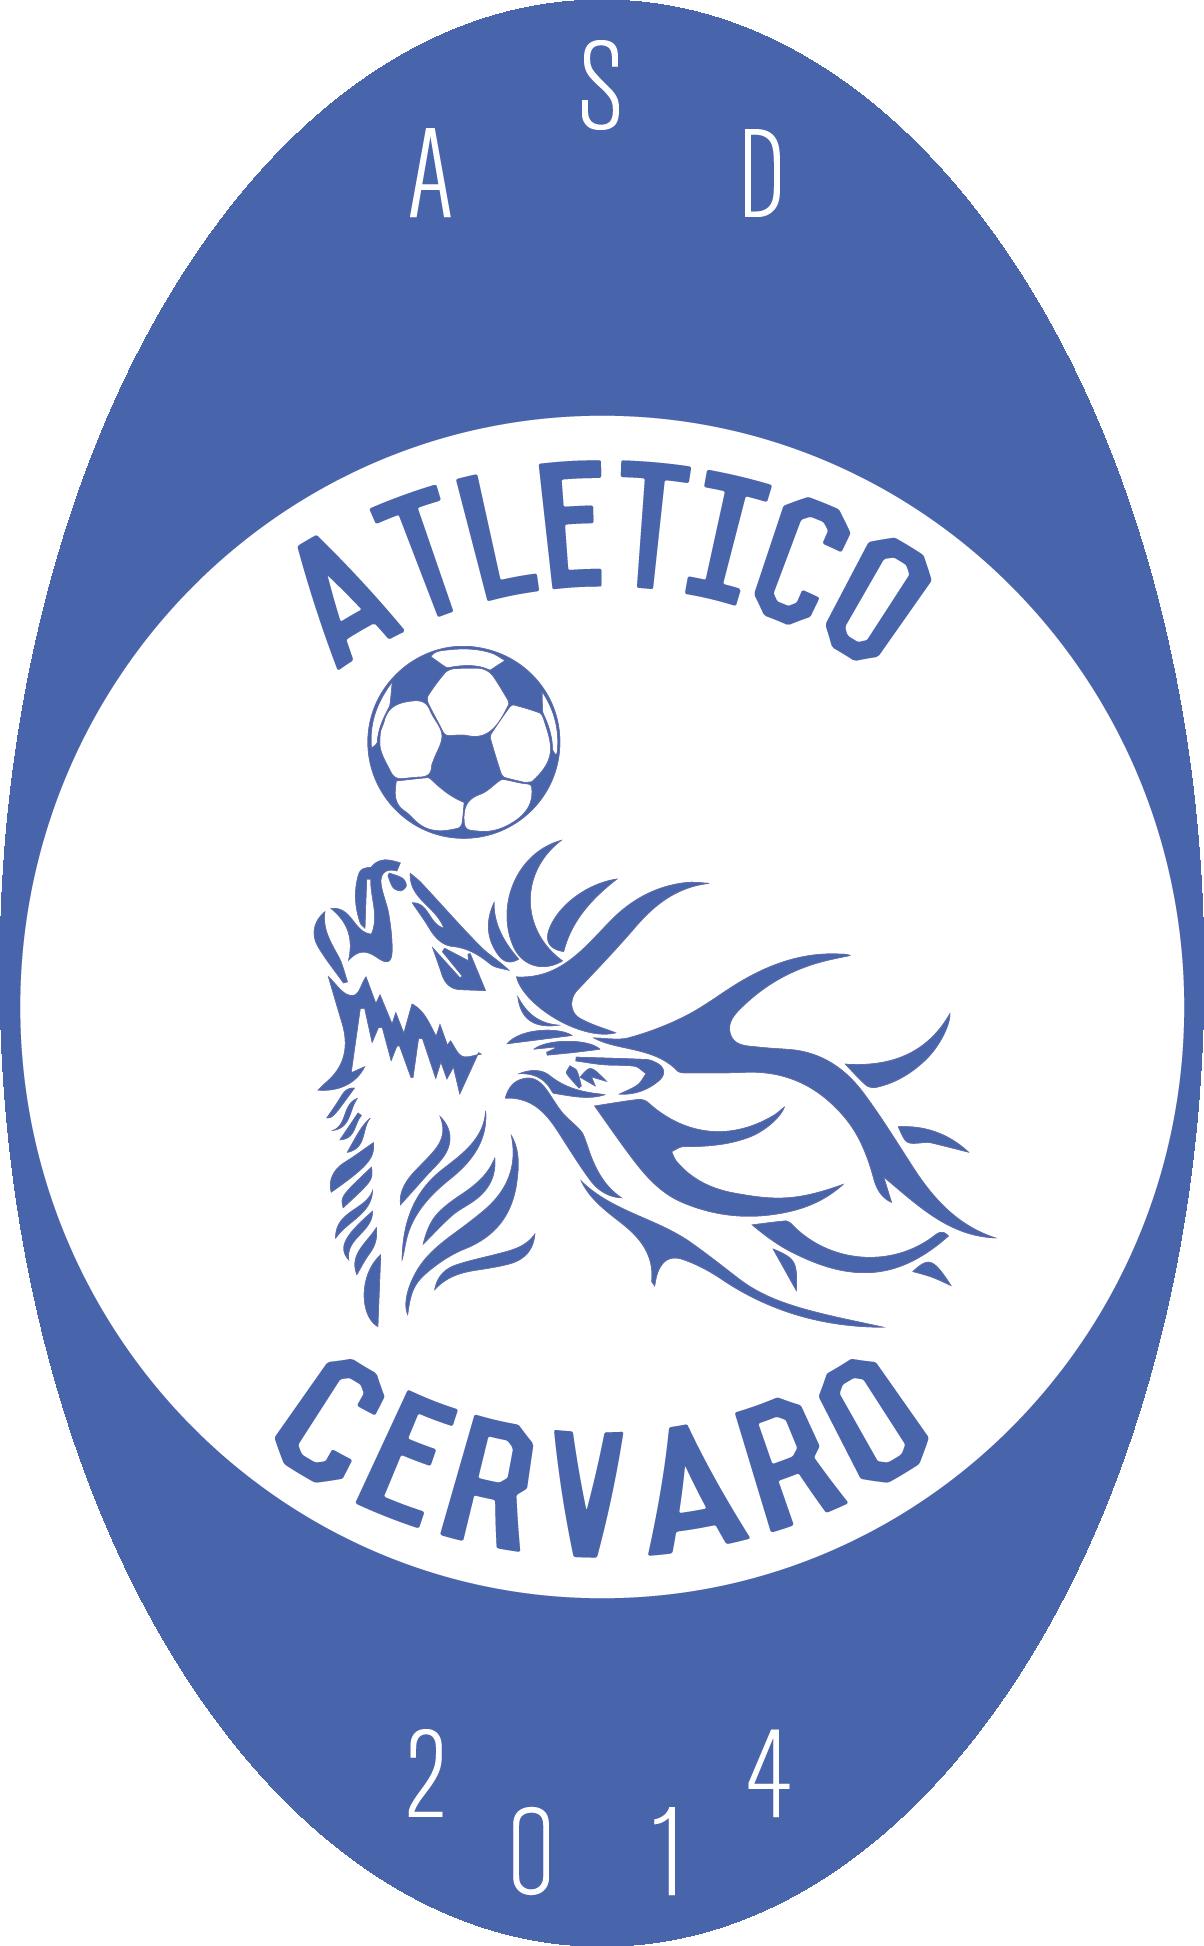 ATLETICO CERVARO